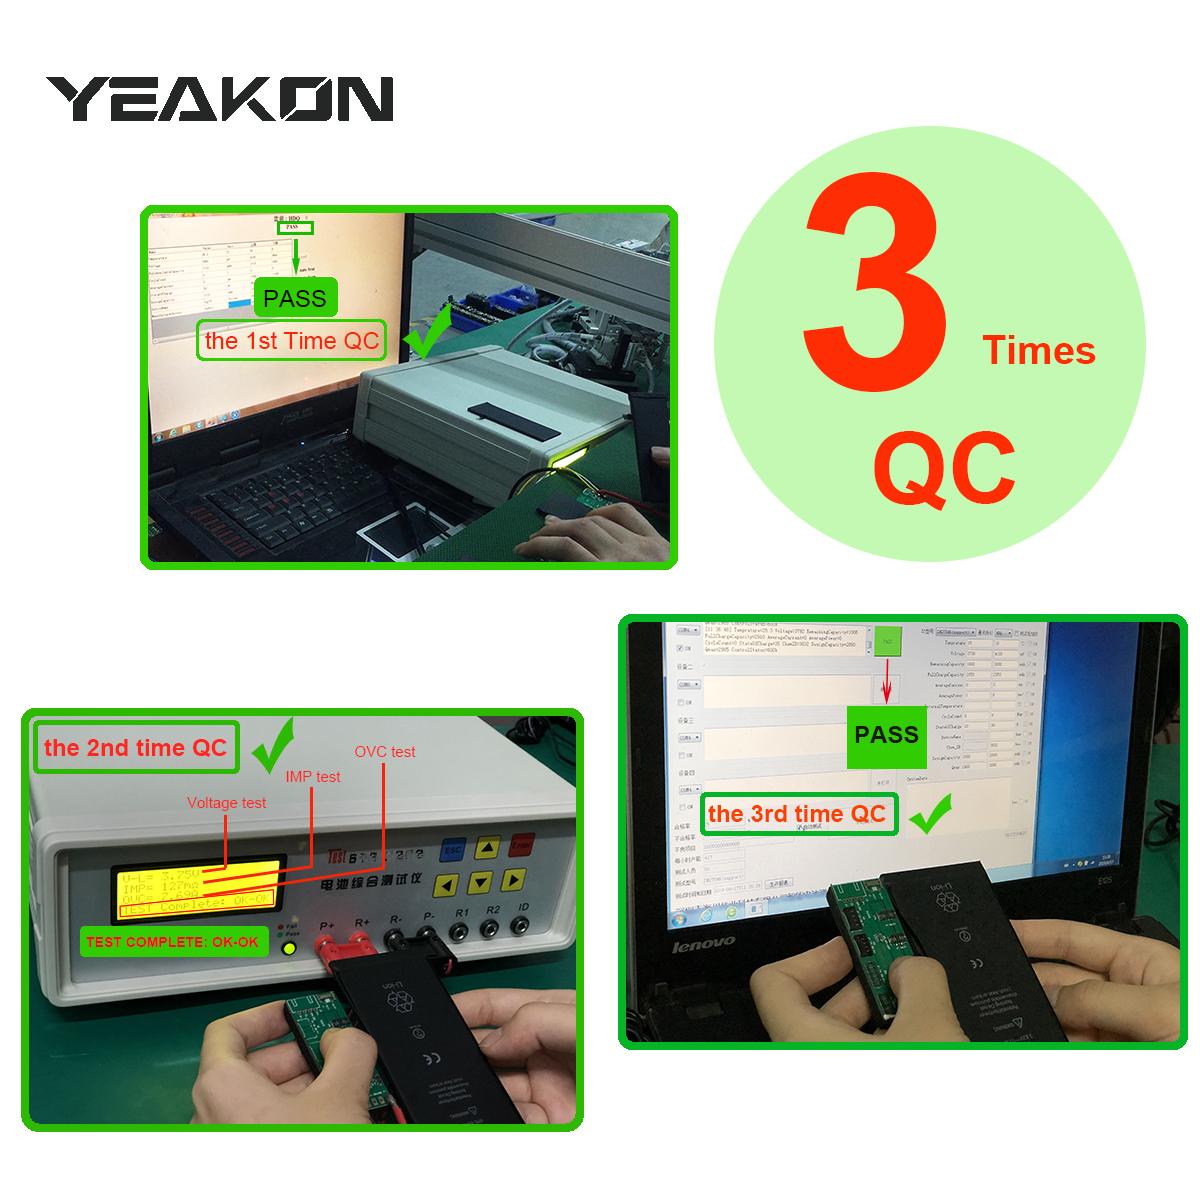 Yeakon XS X S запасная аккумуляторная батарея для iPhone 5 5S 5C SE, 6, 6S, 6P 6SP 7 7G 7P 8 8G 8P Plus X XS MAX XR 11 12 13 Pro MAX батареи